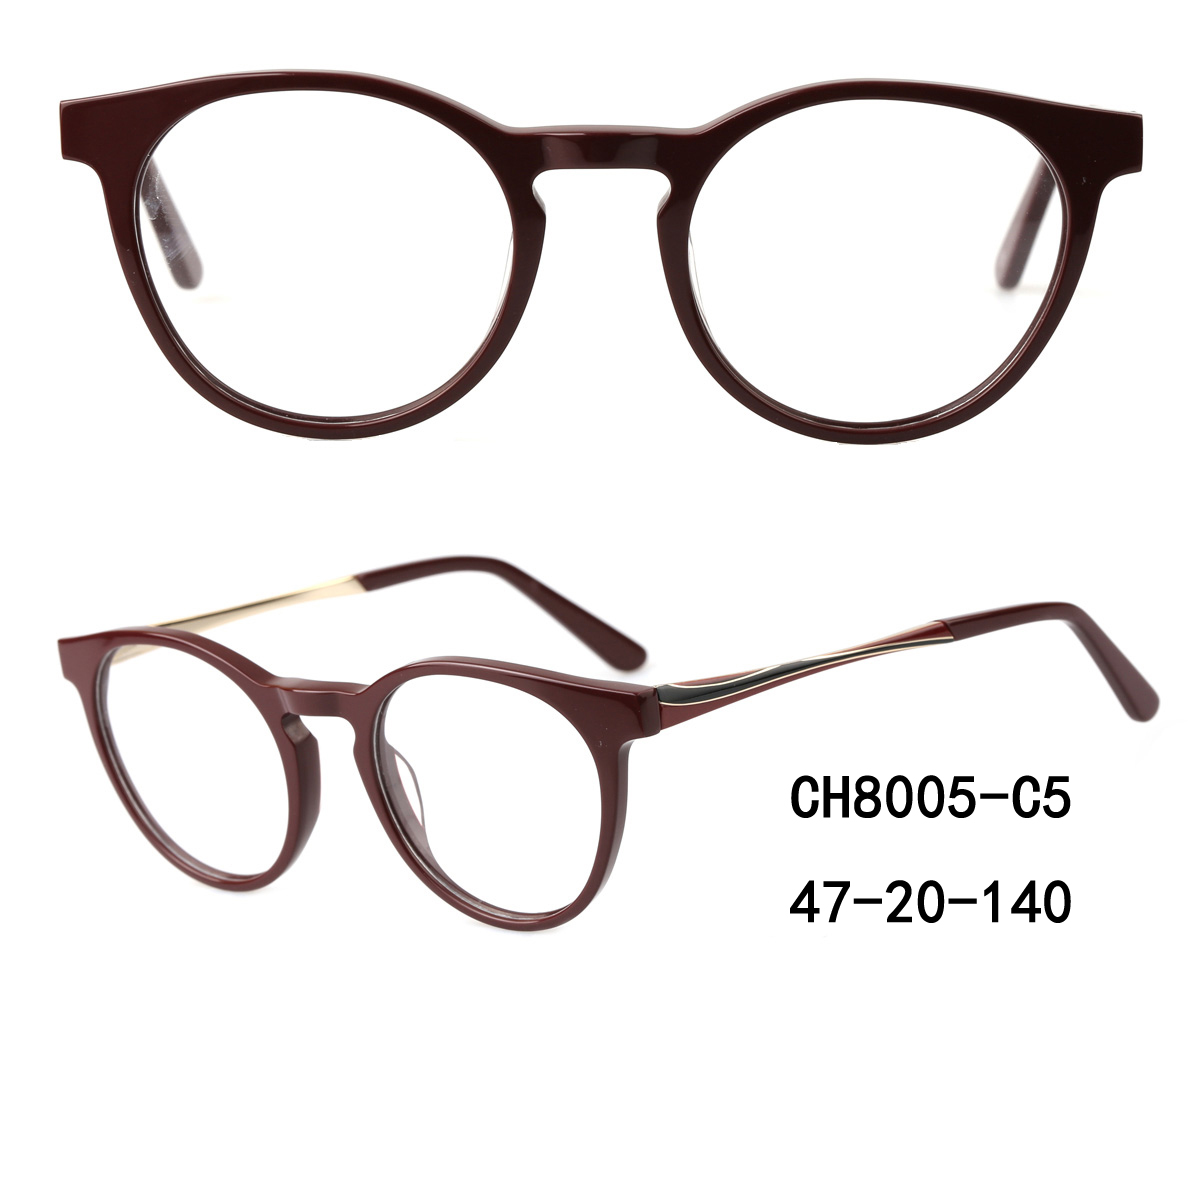 Round Acetate Optical Frames Oem Odm,Eyeglasse Spectacle Frames With Printing